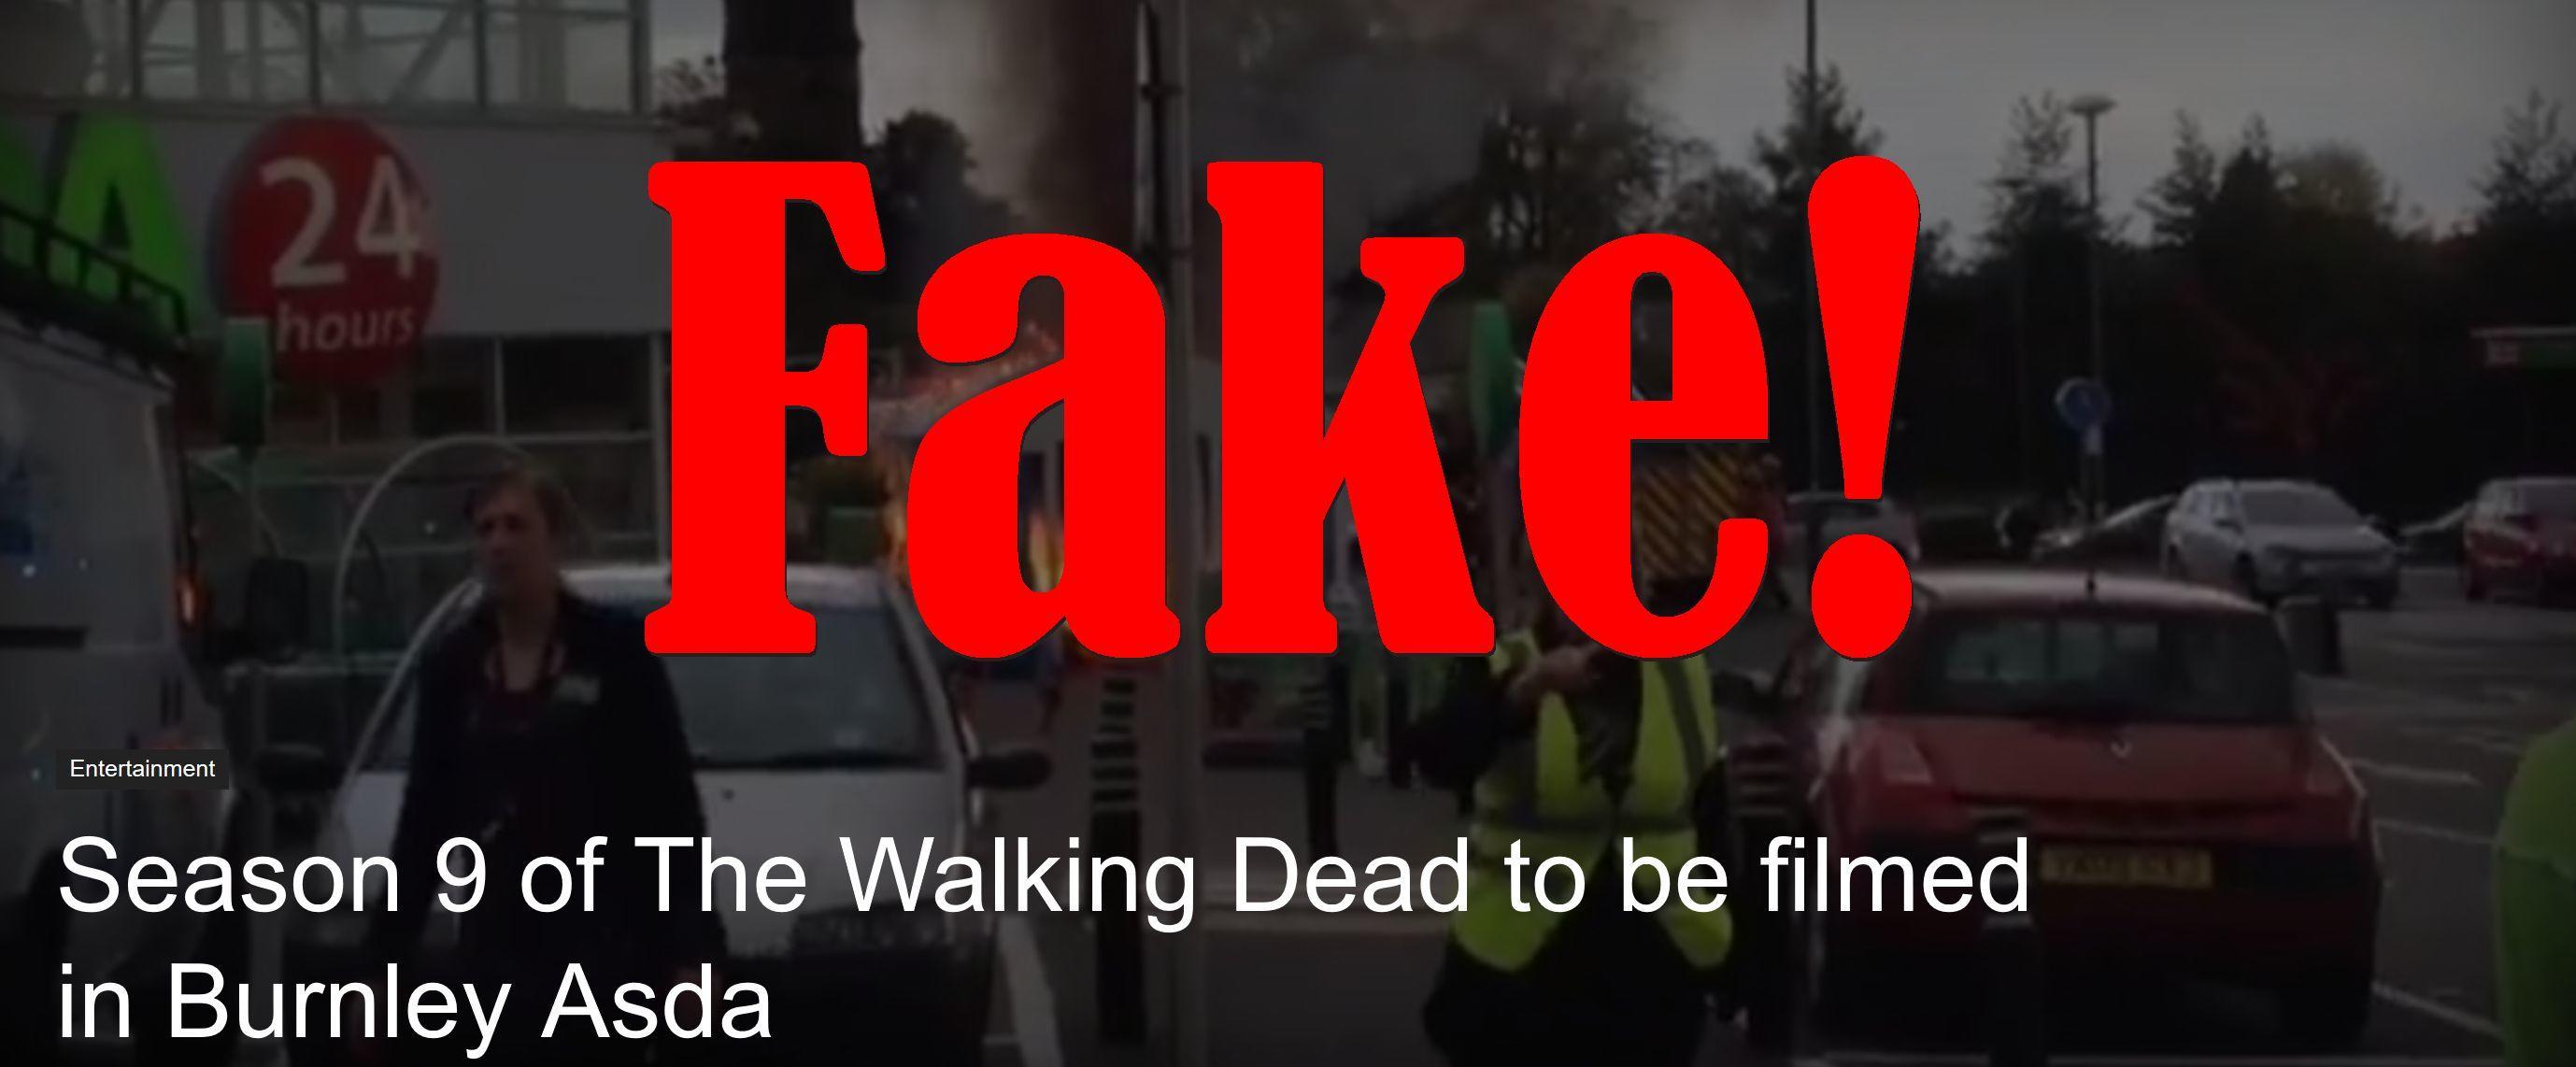 Fake News: Season 9 of The Walking Dead NOT To Be Filmed in Burnley Asda